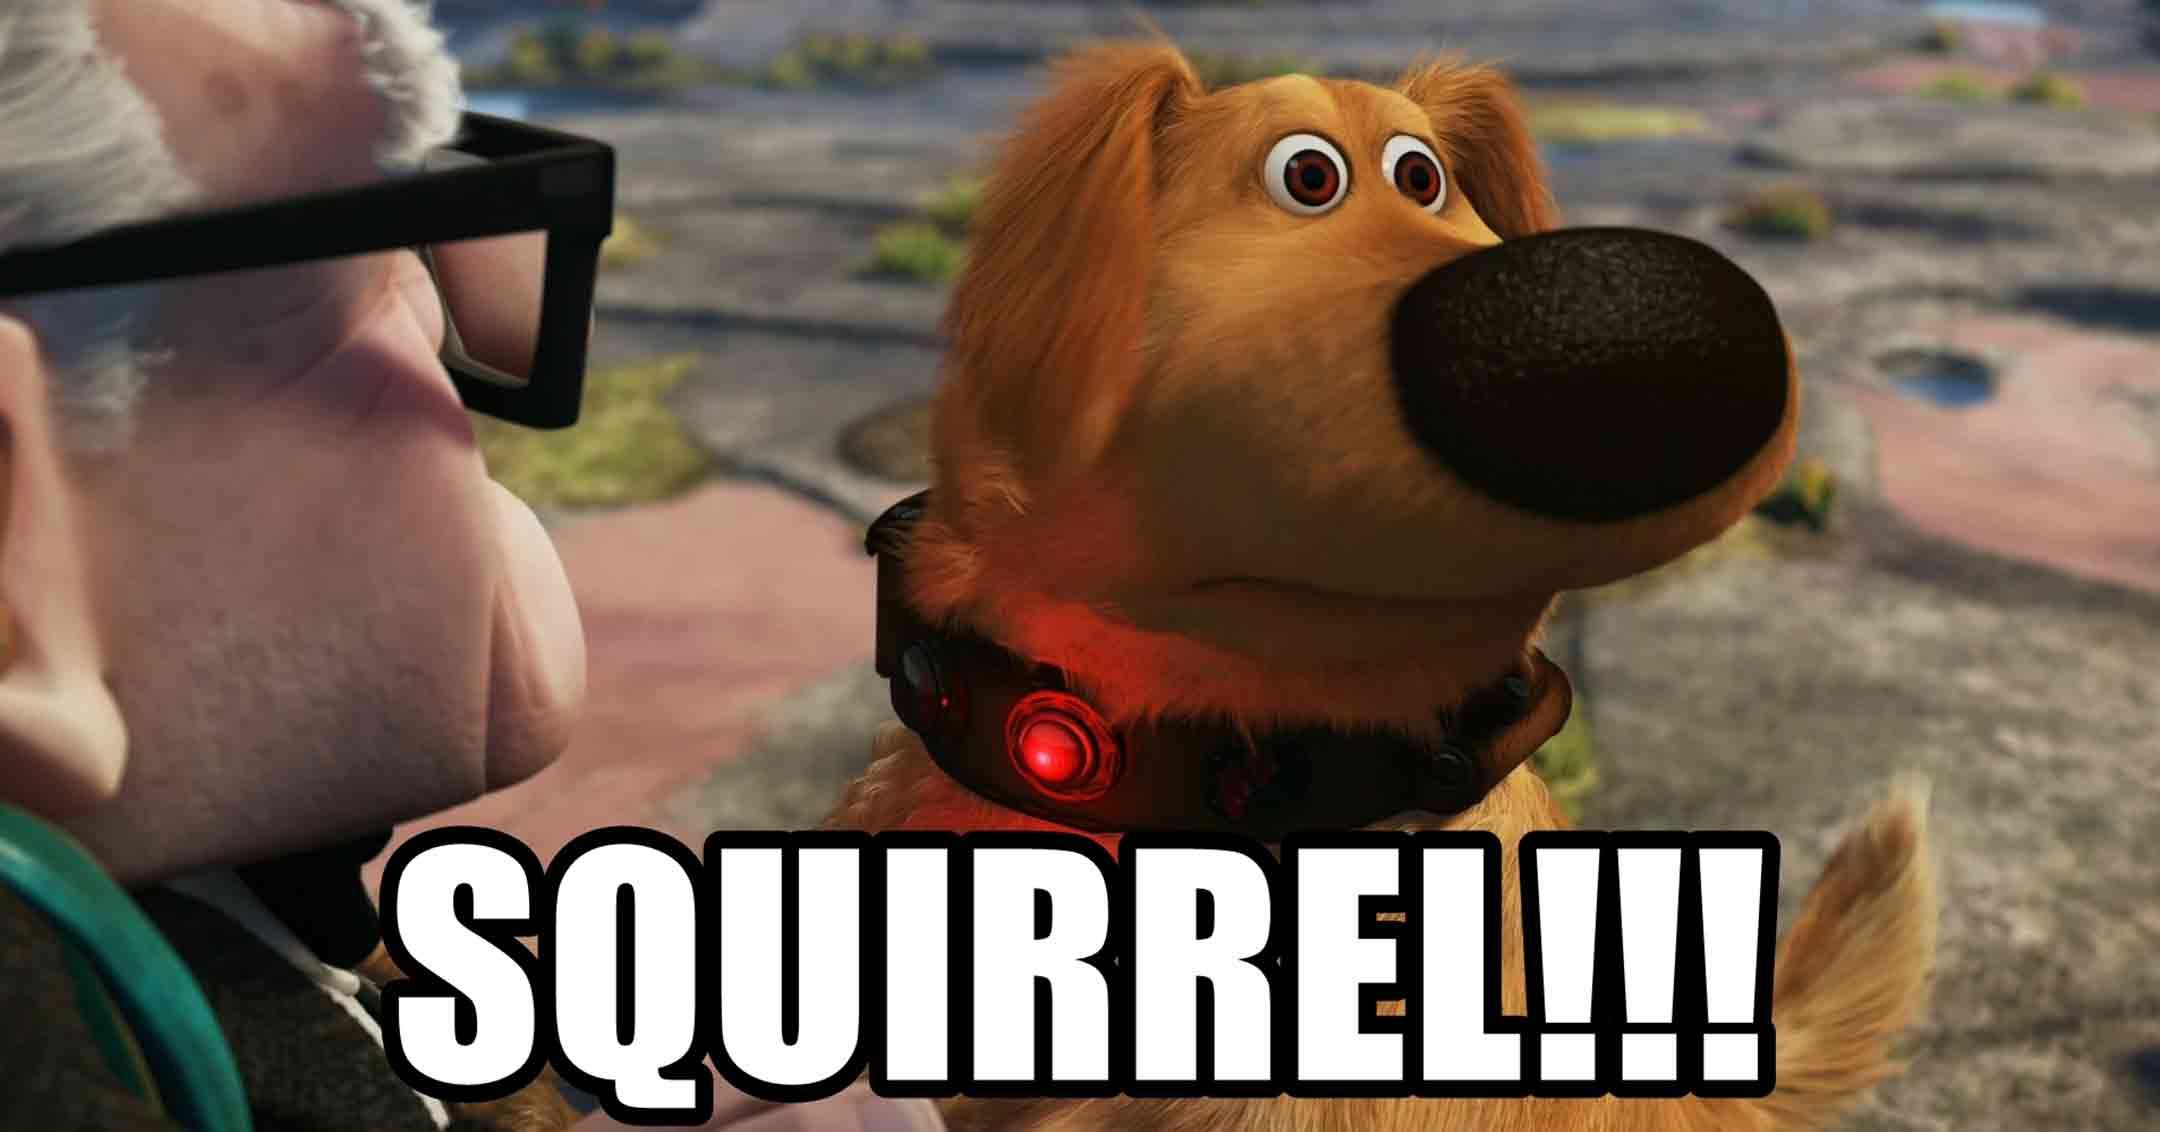 Squirrel! | MouseMingle.com